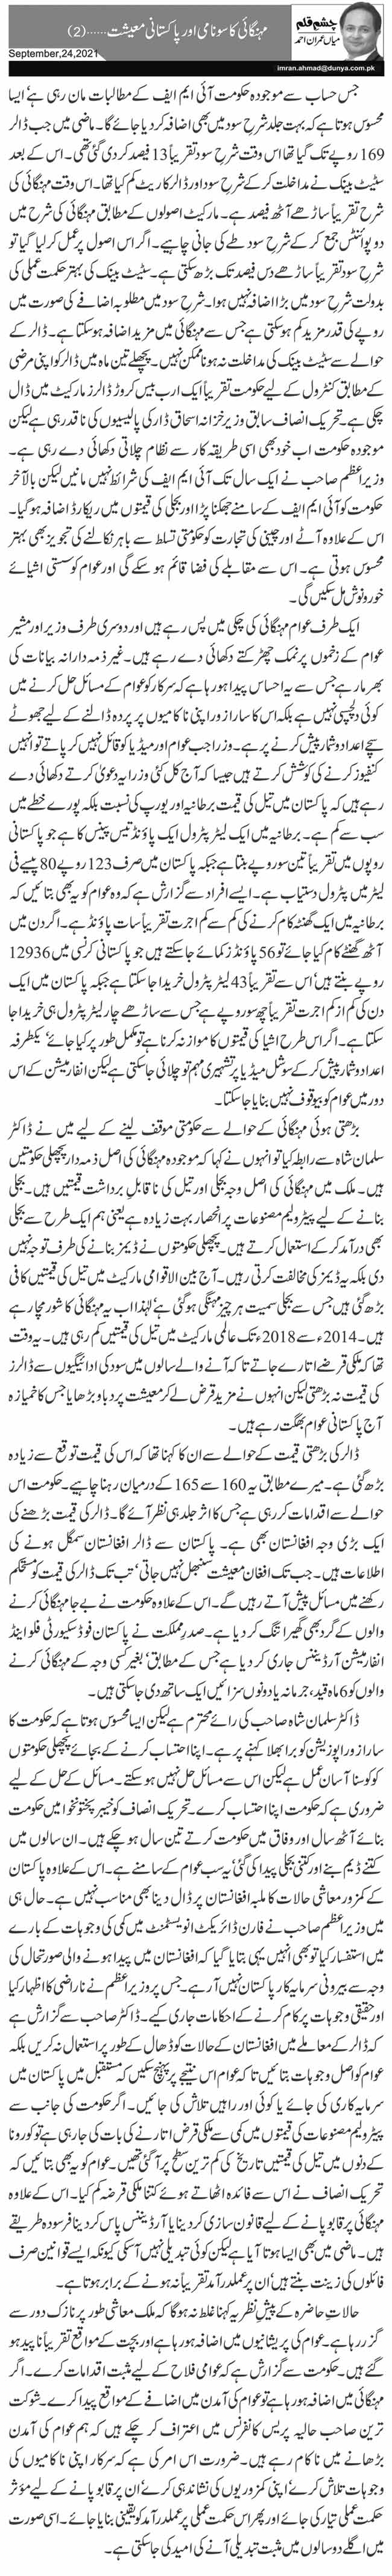 مہنگائی کا سونامی اور پاکستانی معیشت…(2)